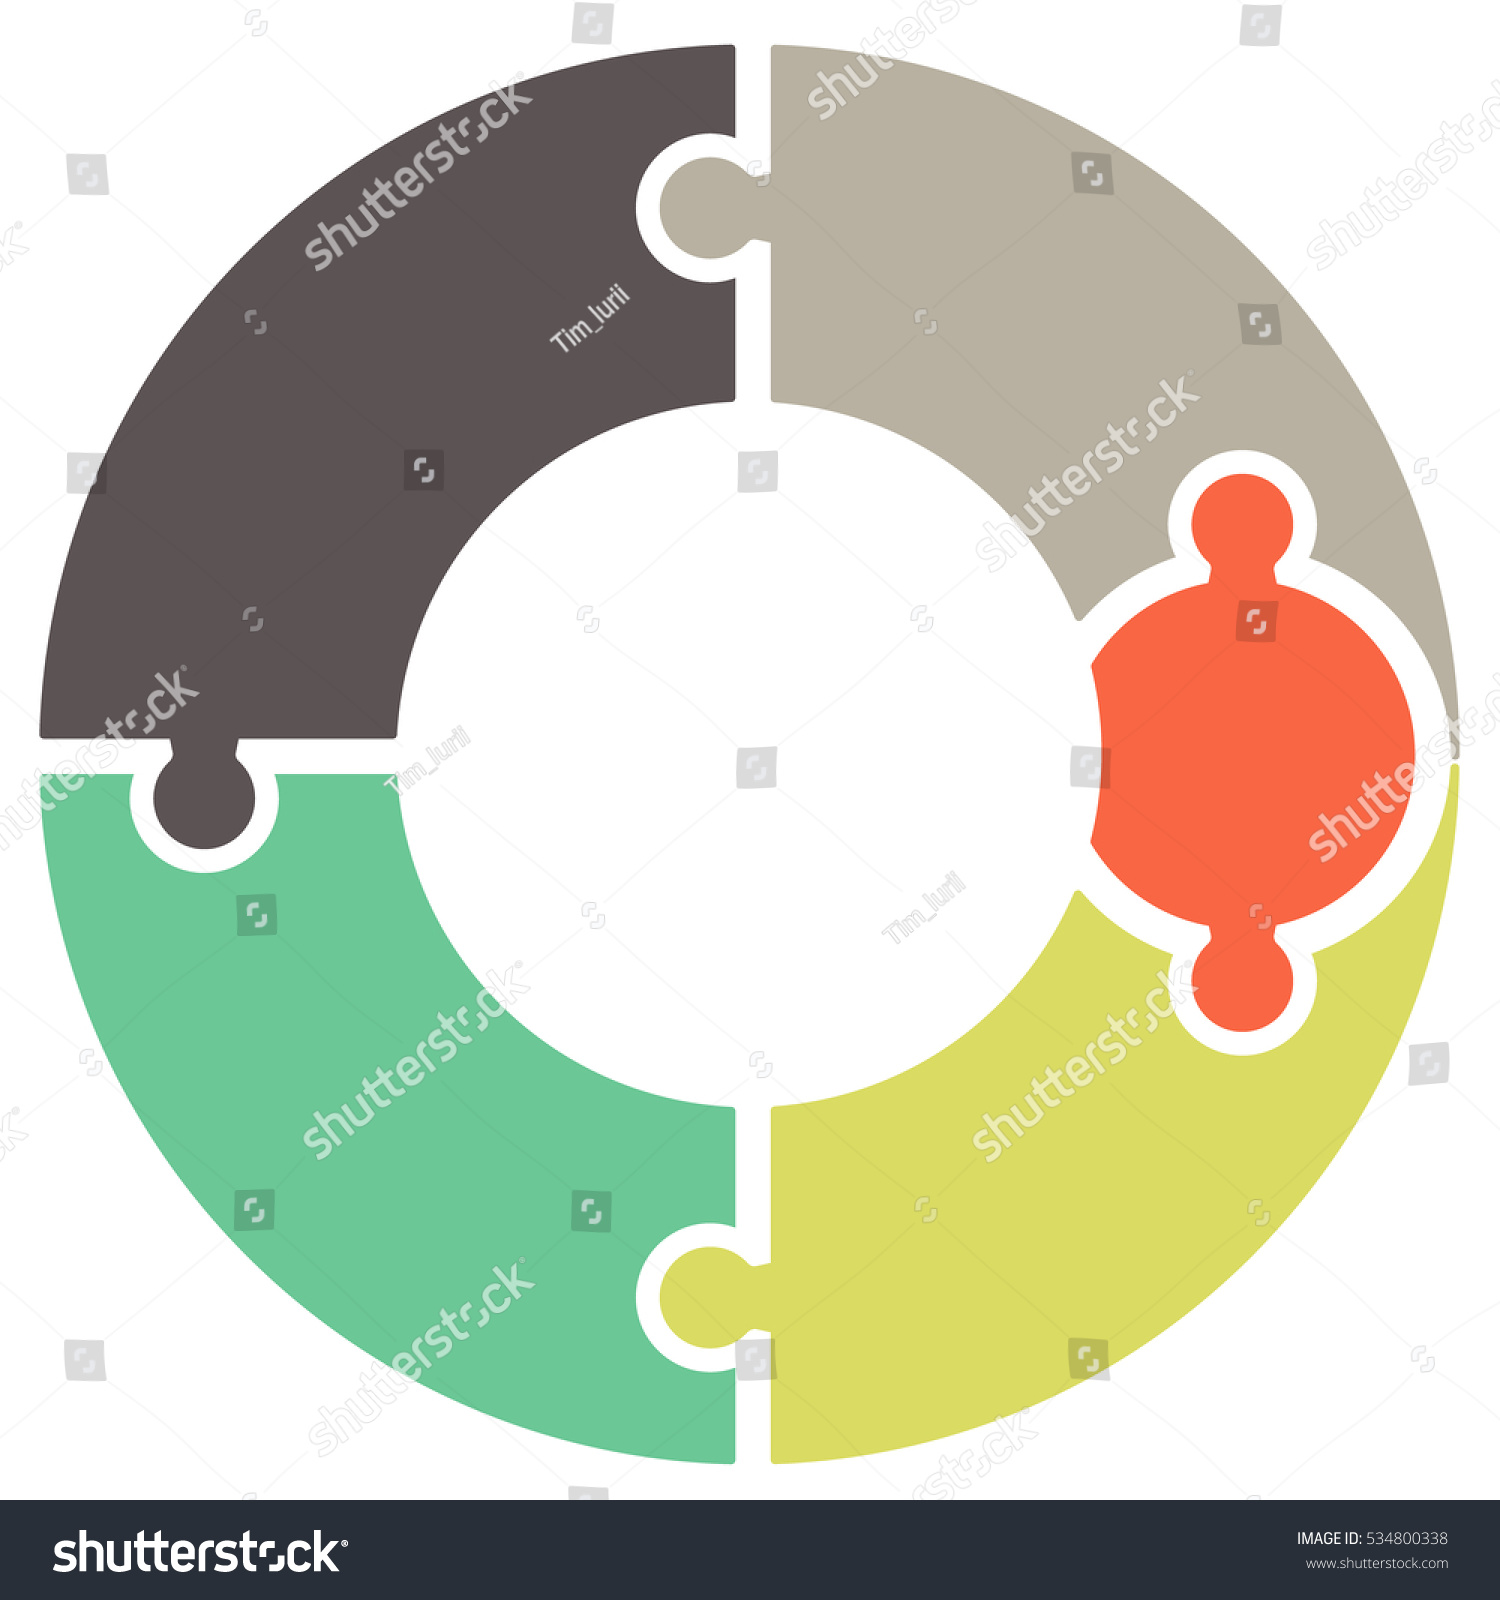 Infographics vector diagram pattern pie chart stock vector infographics vector diagram pattern pie chart stock vector 534800338 shutterstock nvjuhfo Gallery